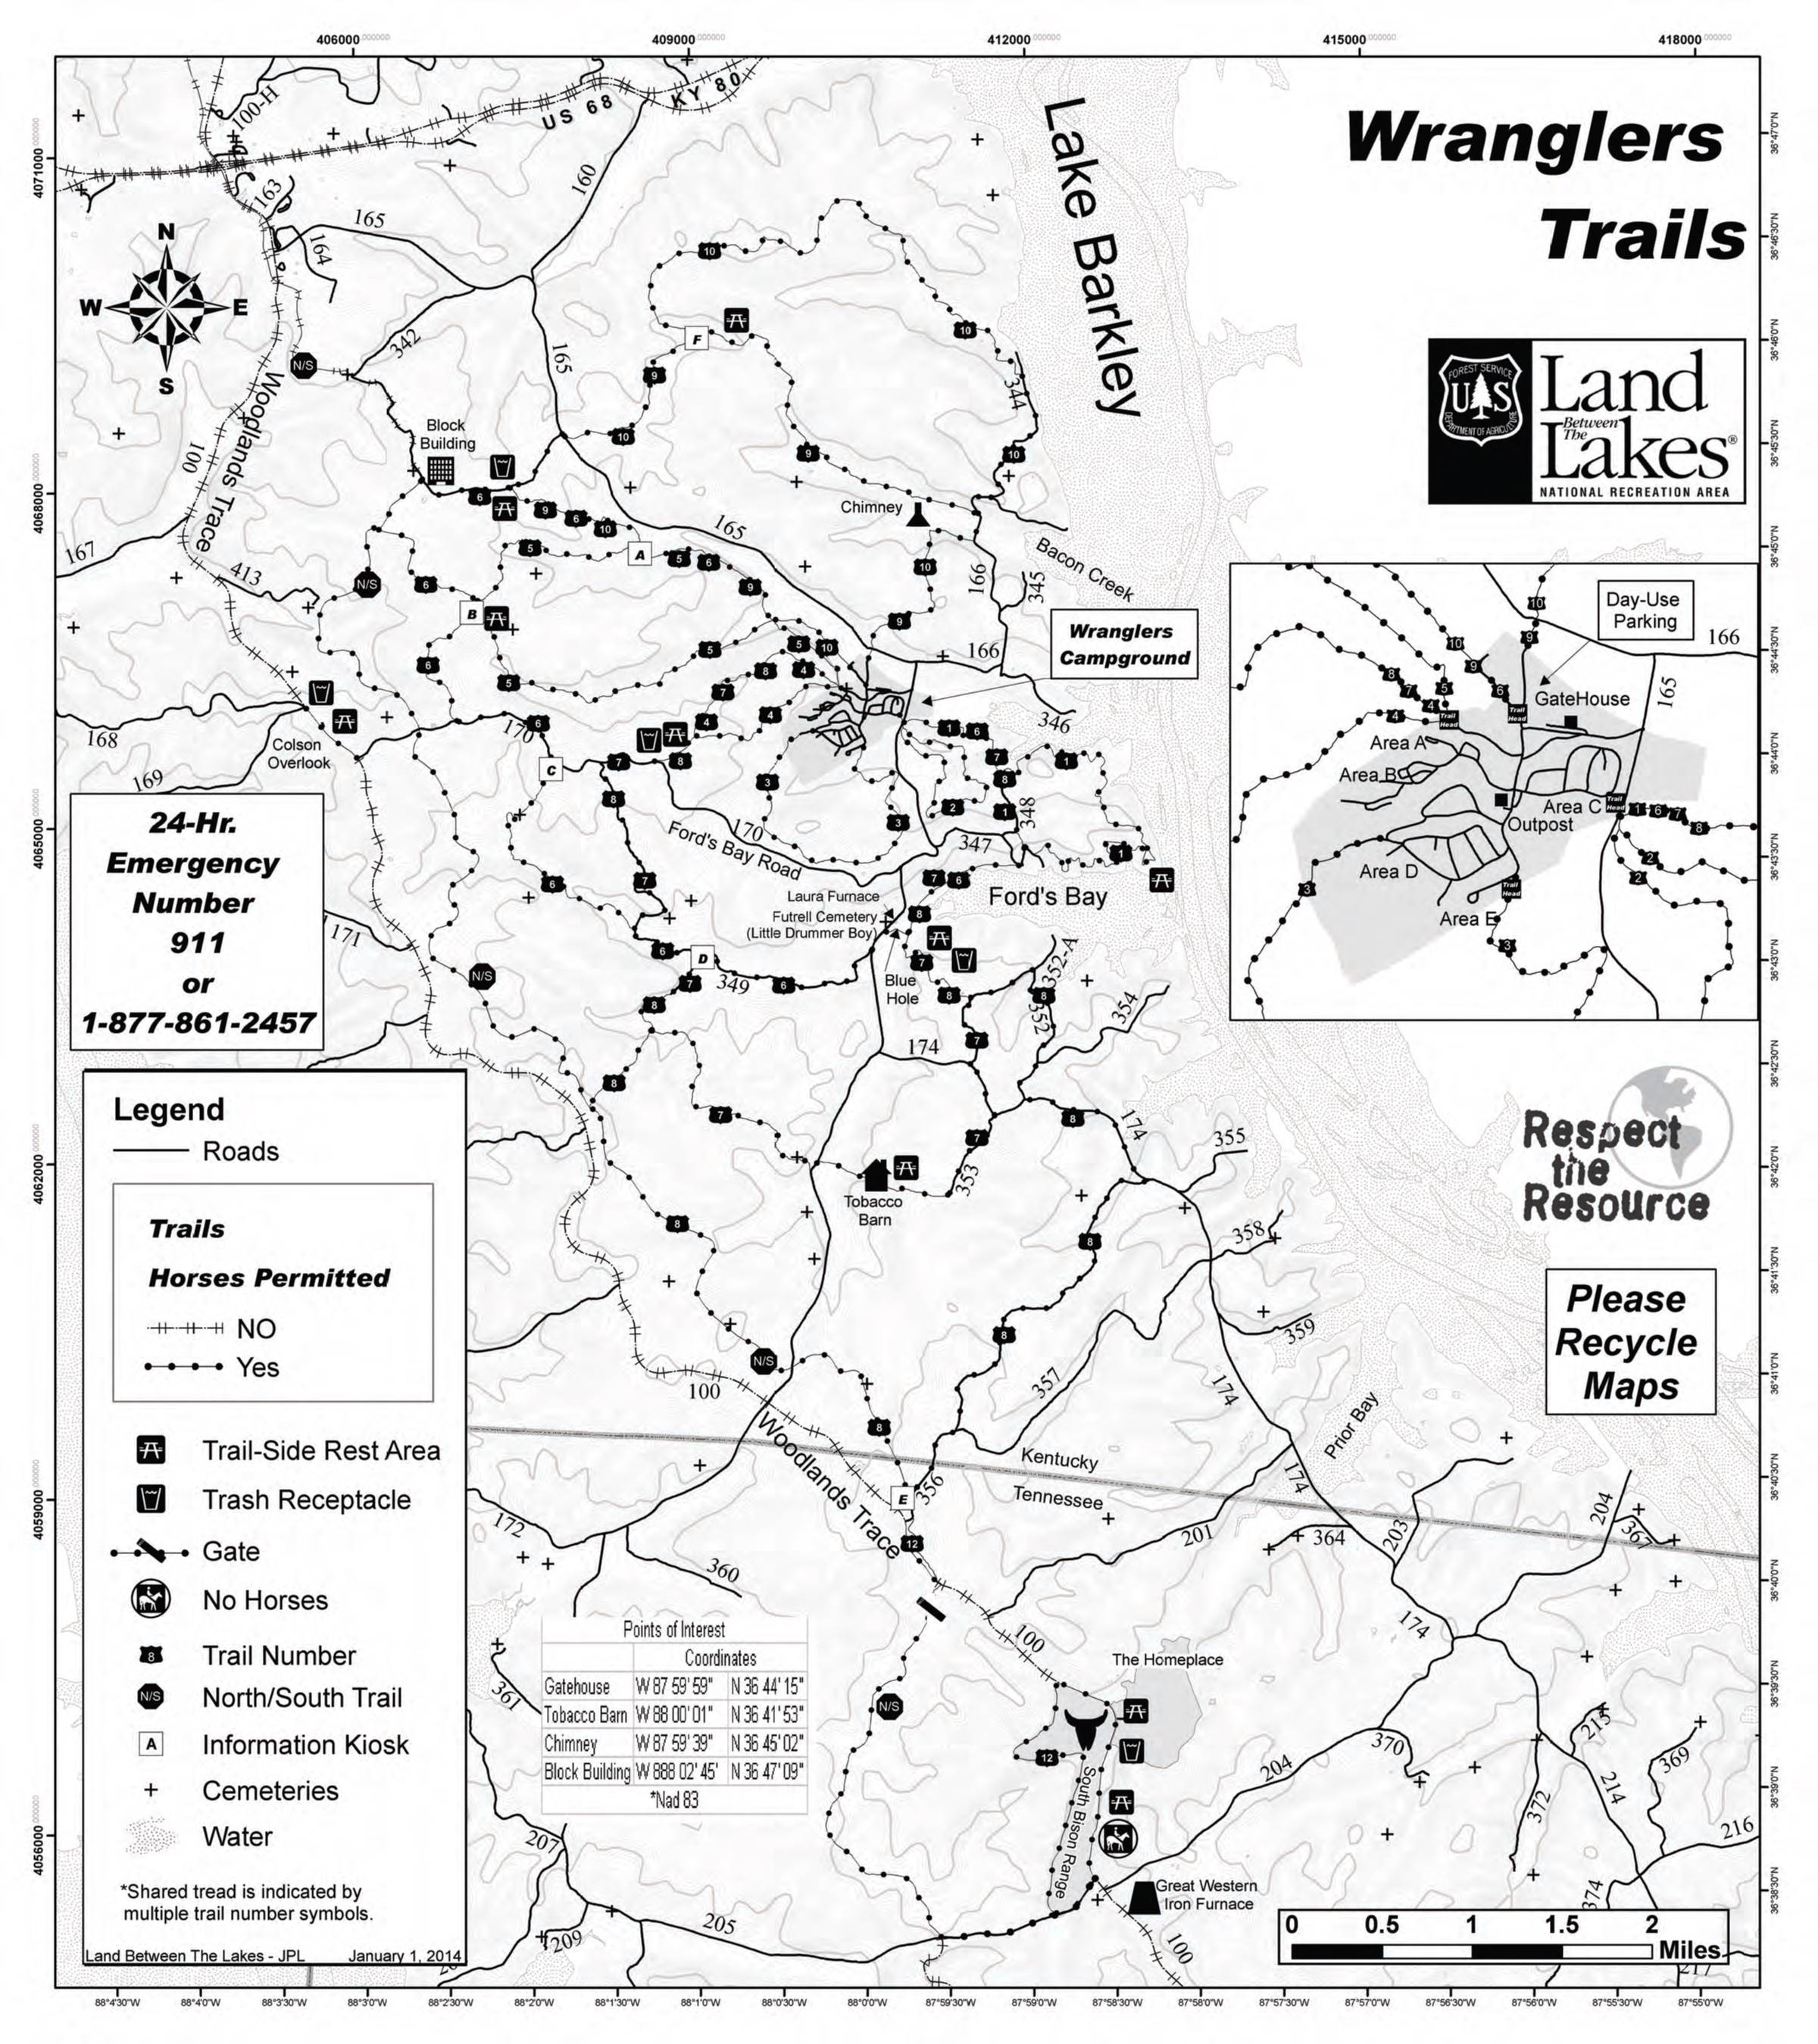 Kentucky Lake Area Maps